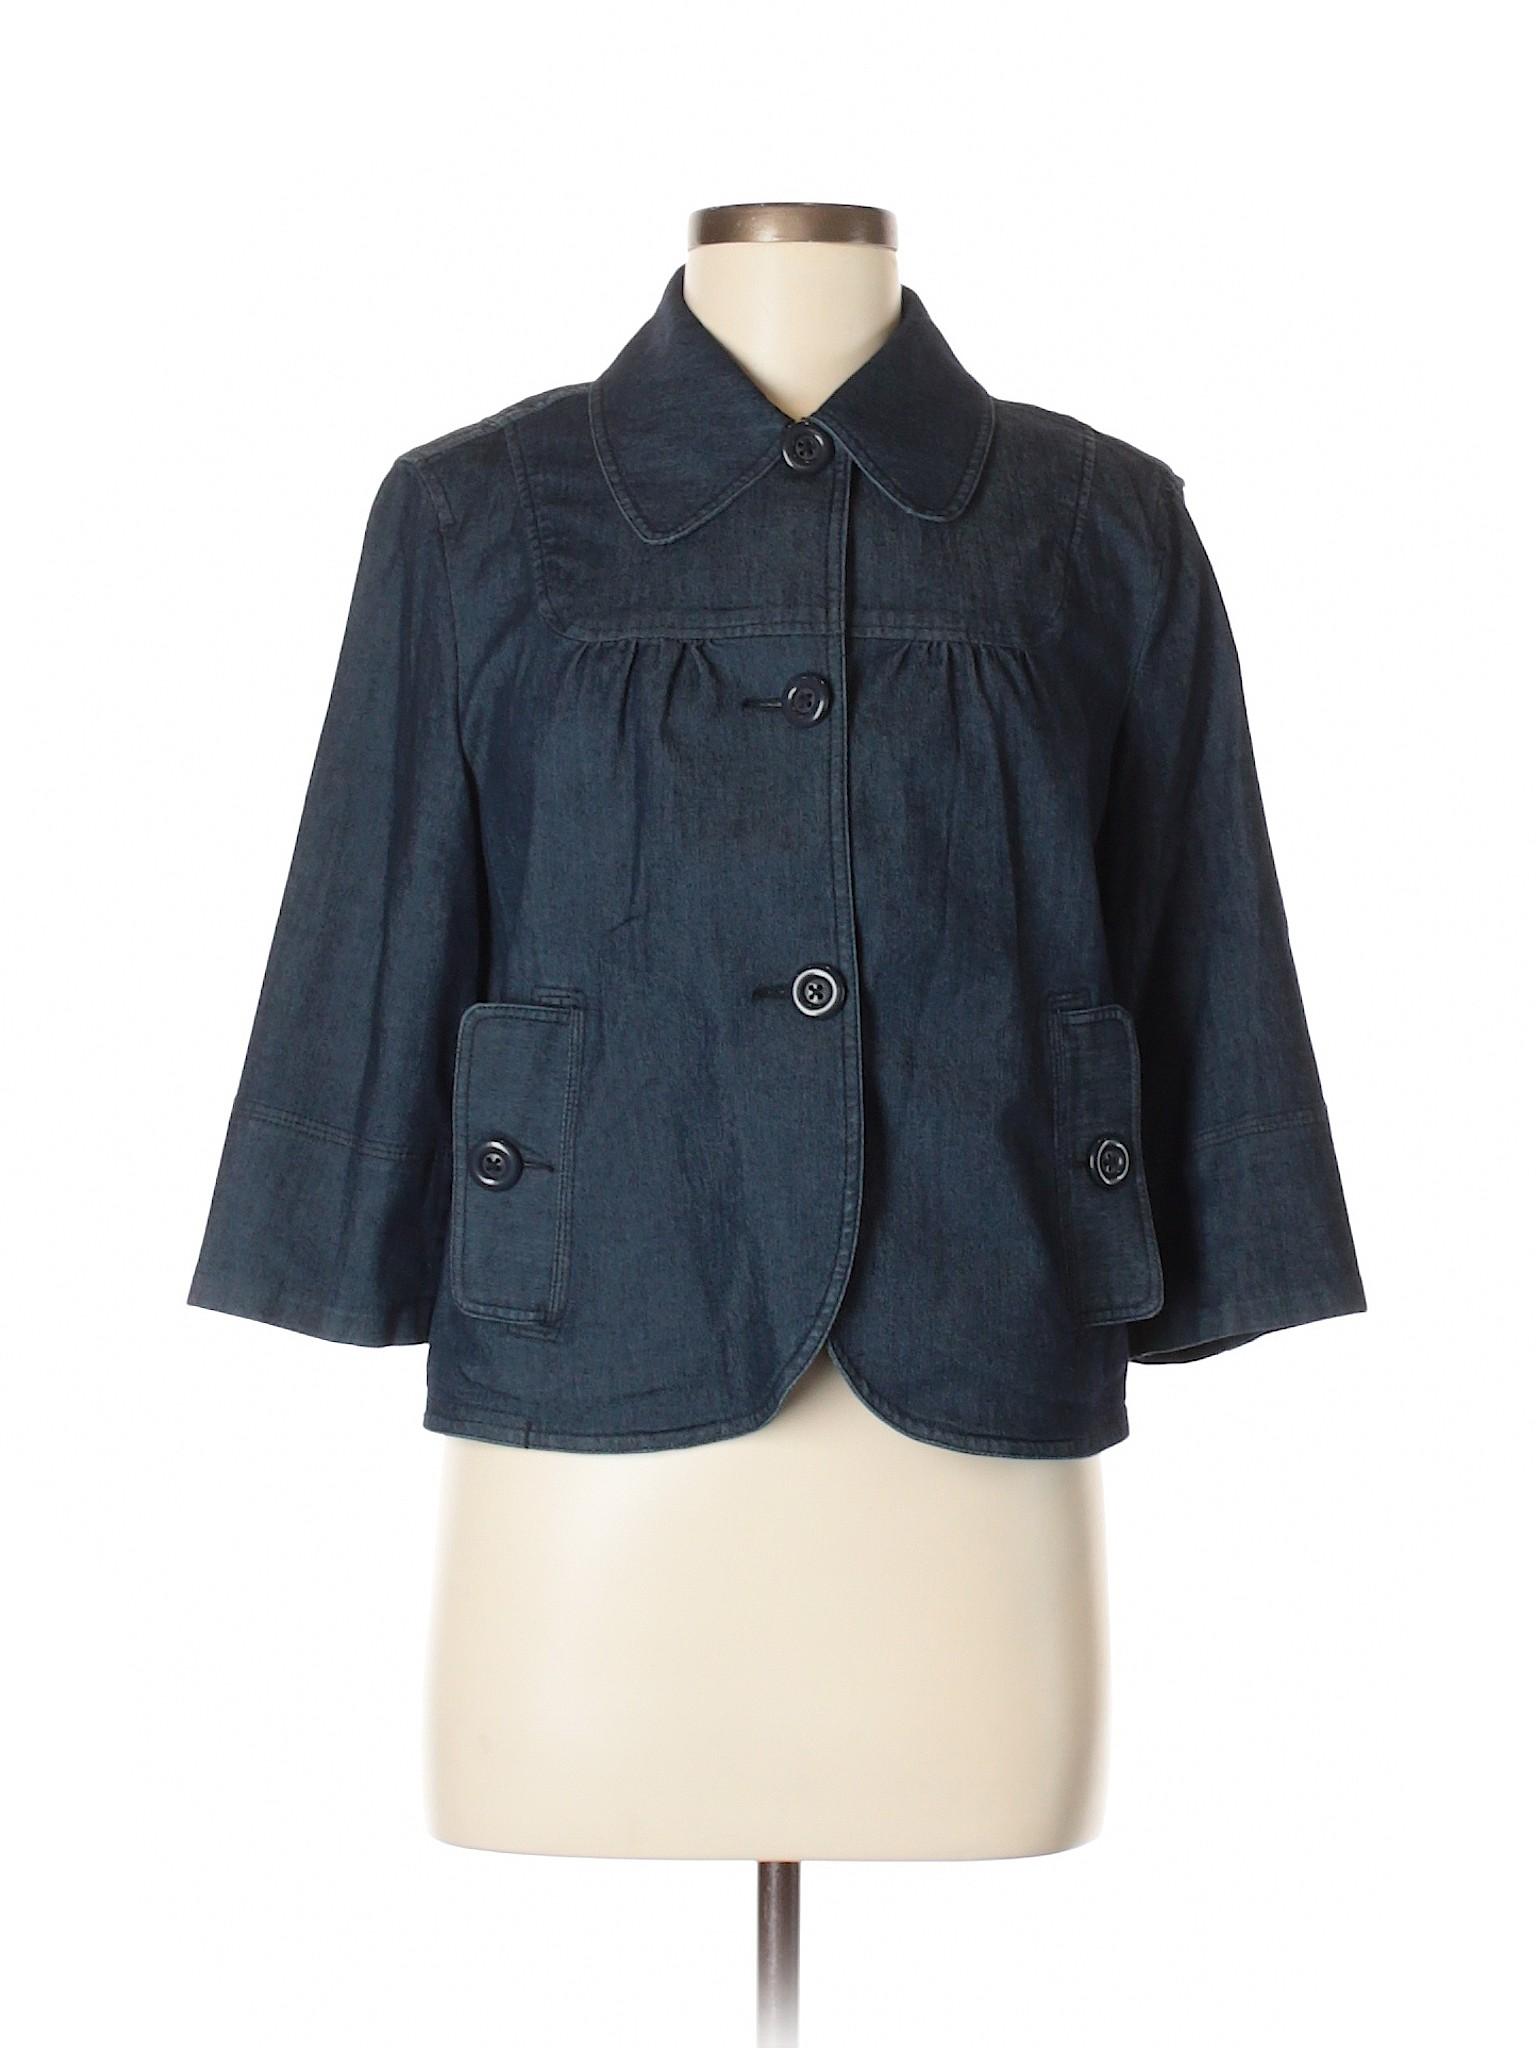 LARRY Denim Dressbarn LEVINE winter for Jacket Leisure S5qUvwBx